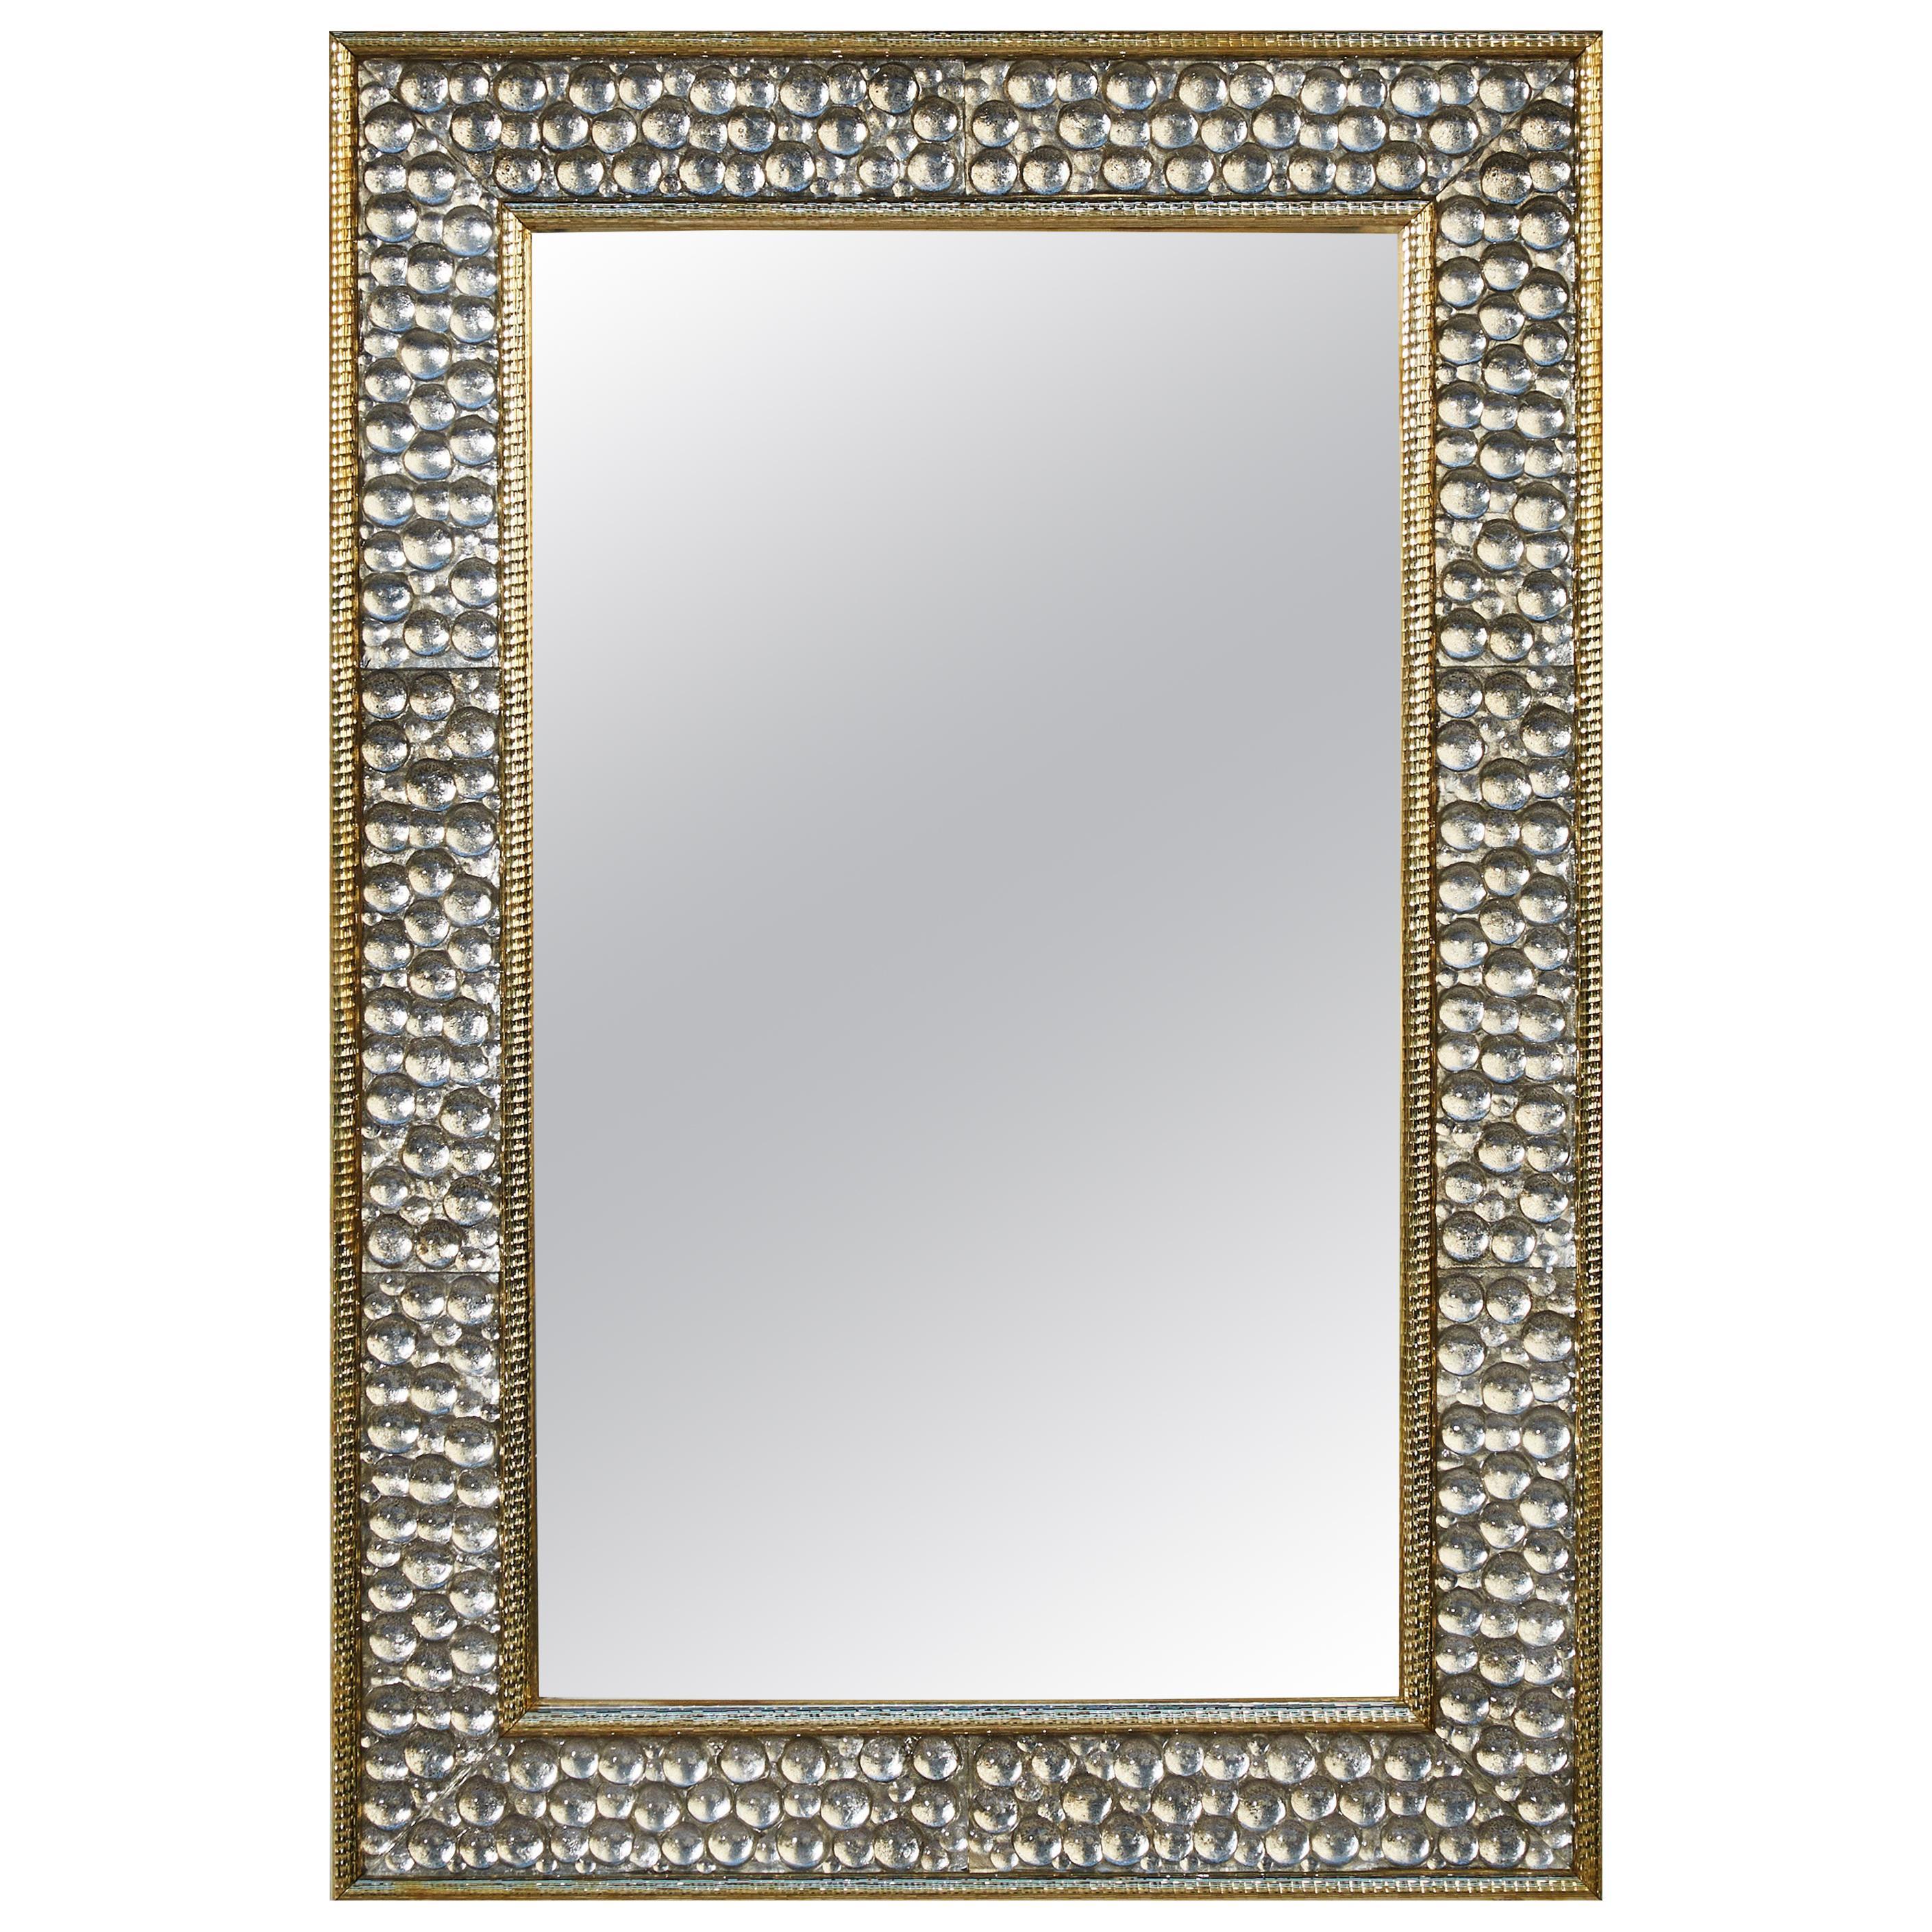 Murano Glass Mirror by Studio Glustin